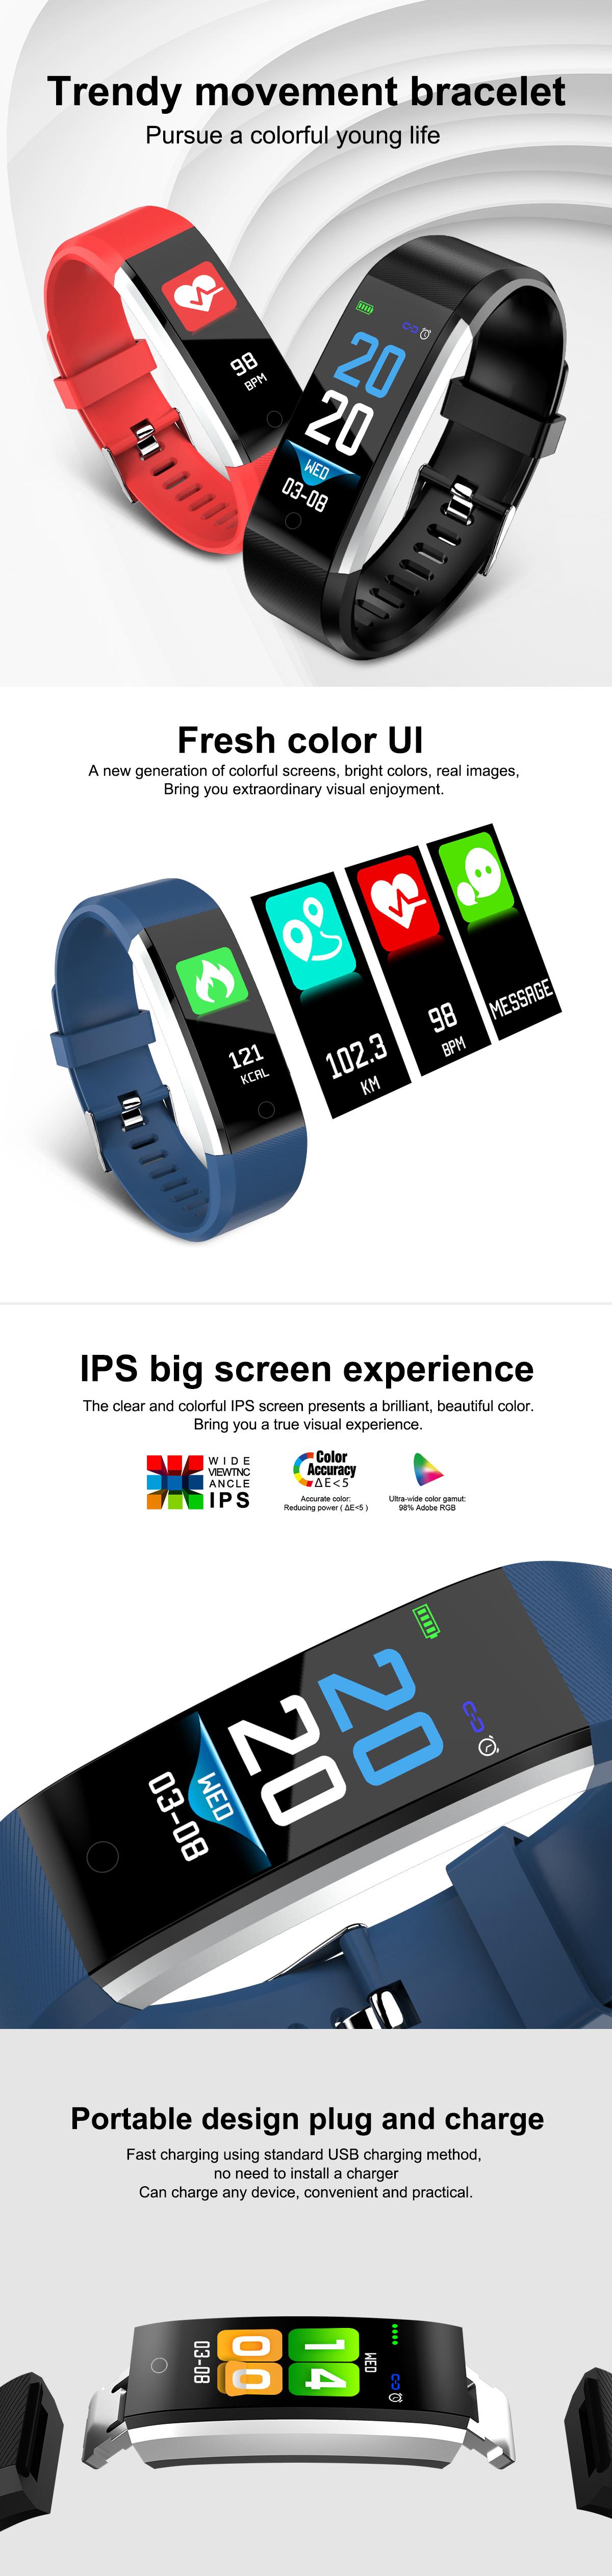 Bakeey ID115 PLUS 2 Color UI Display Smart Watch Blood Pressure Oxygen  Monitor Sport Tracker Watch